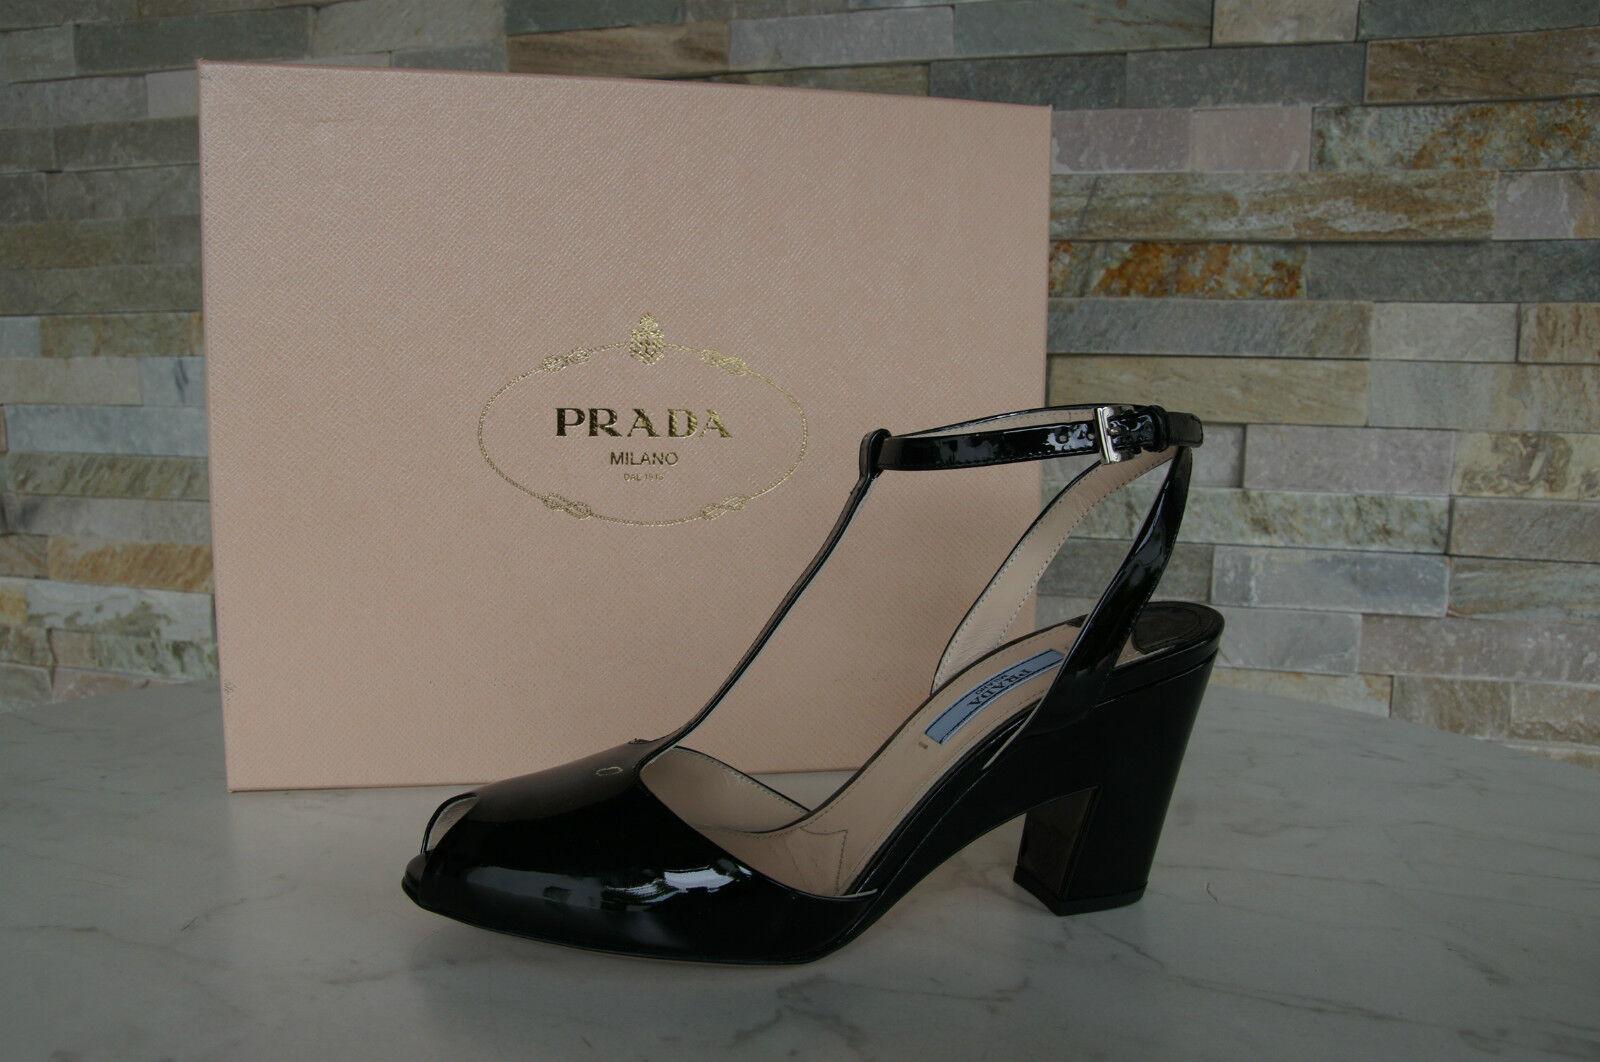 Prada Sandaletten Gr 35,5 Lack T-Strap Lack 35,5 Heels Schuhe Schuhes schwarz neu af7cbf